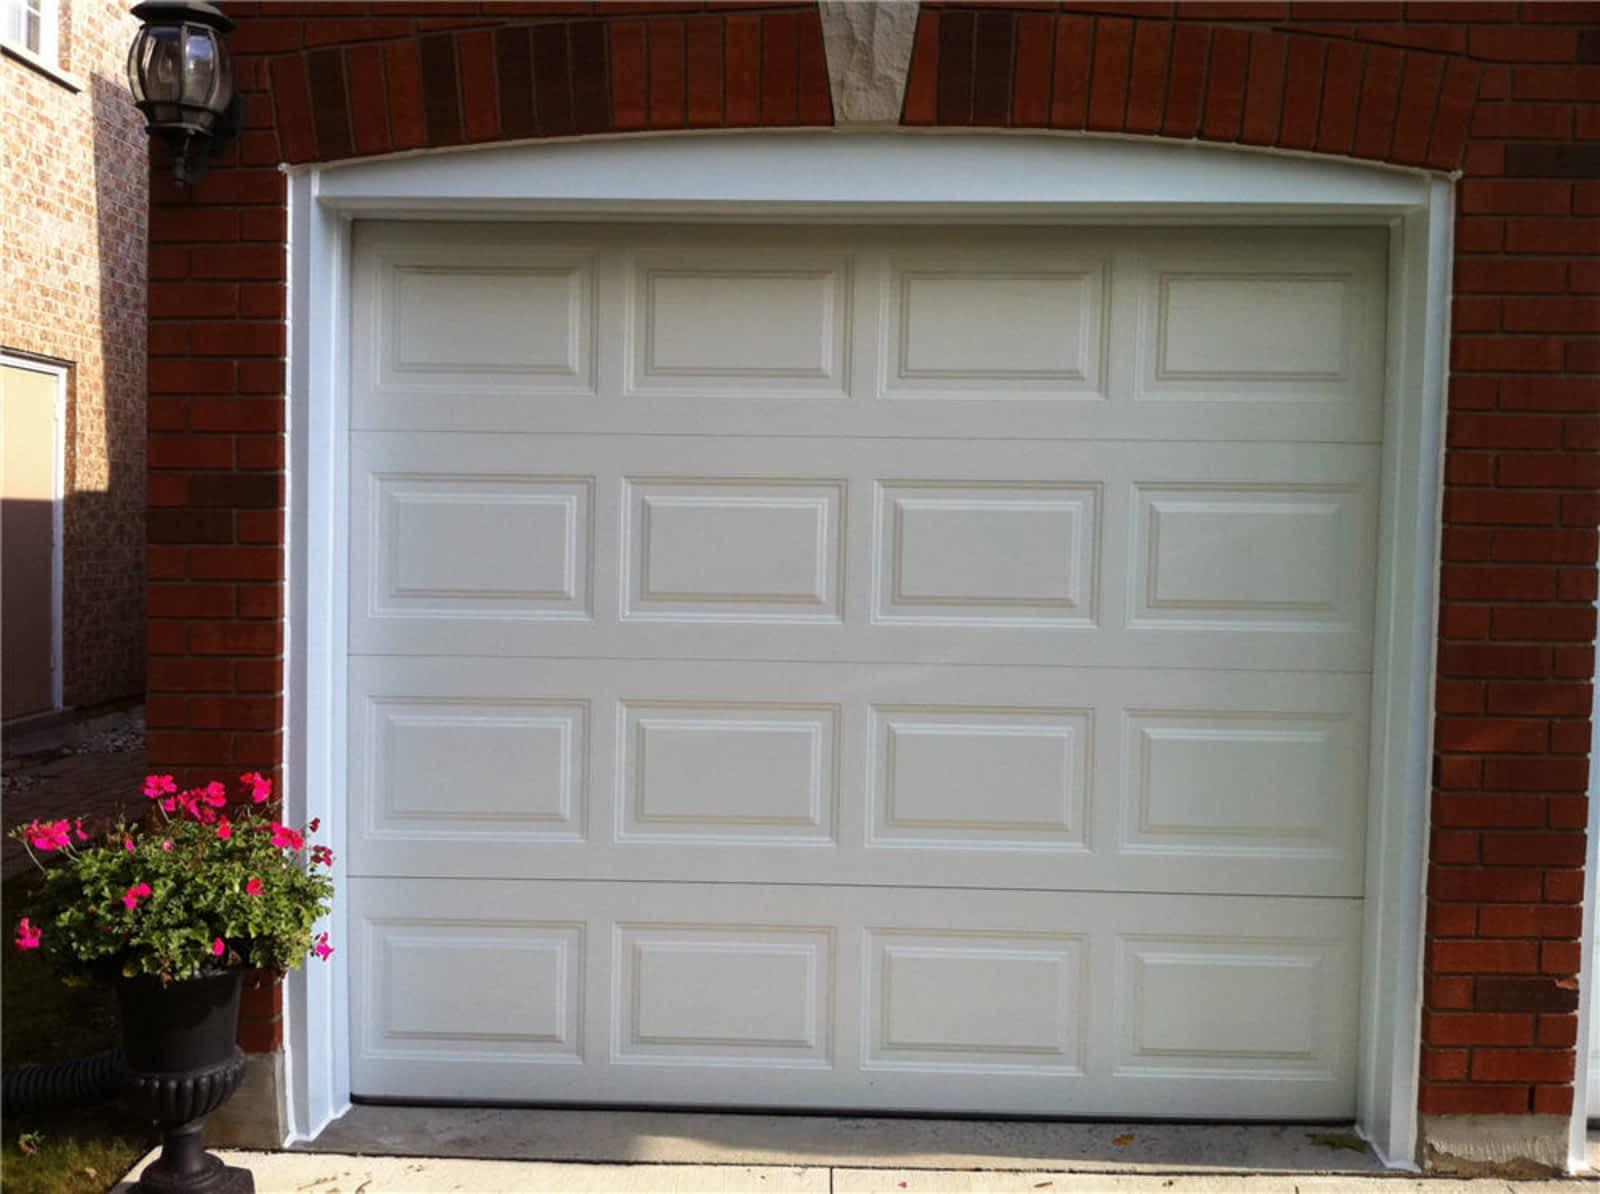 Garage doors hamilton ontario images doors design ideas everlast windows and doors opening hours 1588 stone & Garage Doors Hamilton Image collections - Doors Design Ideas pezcame.com